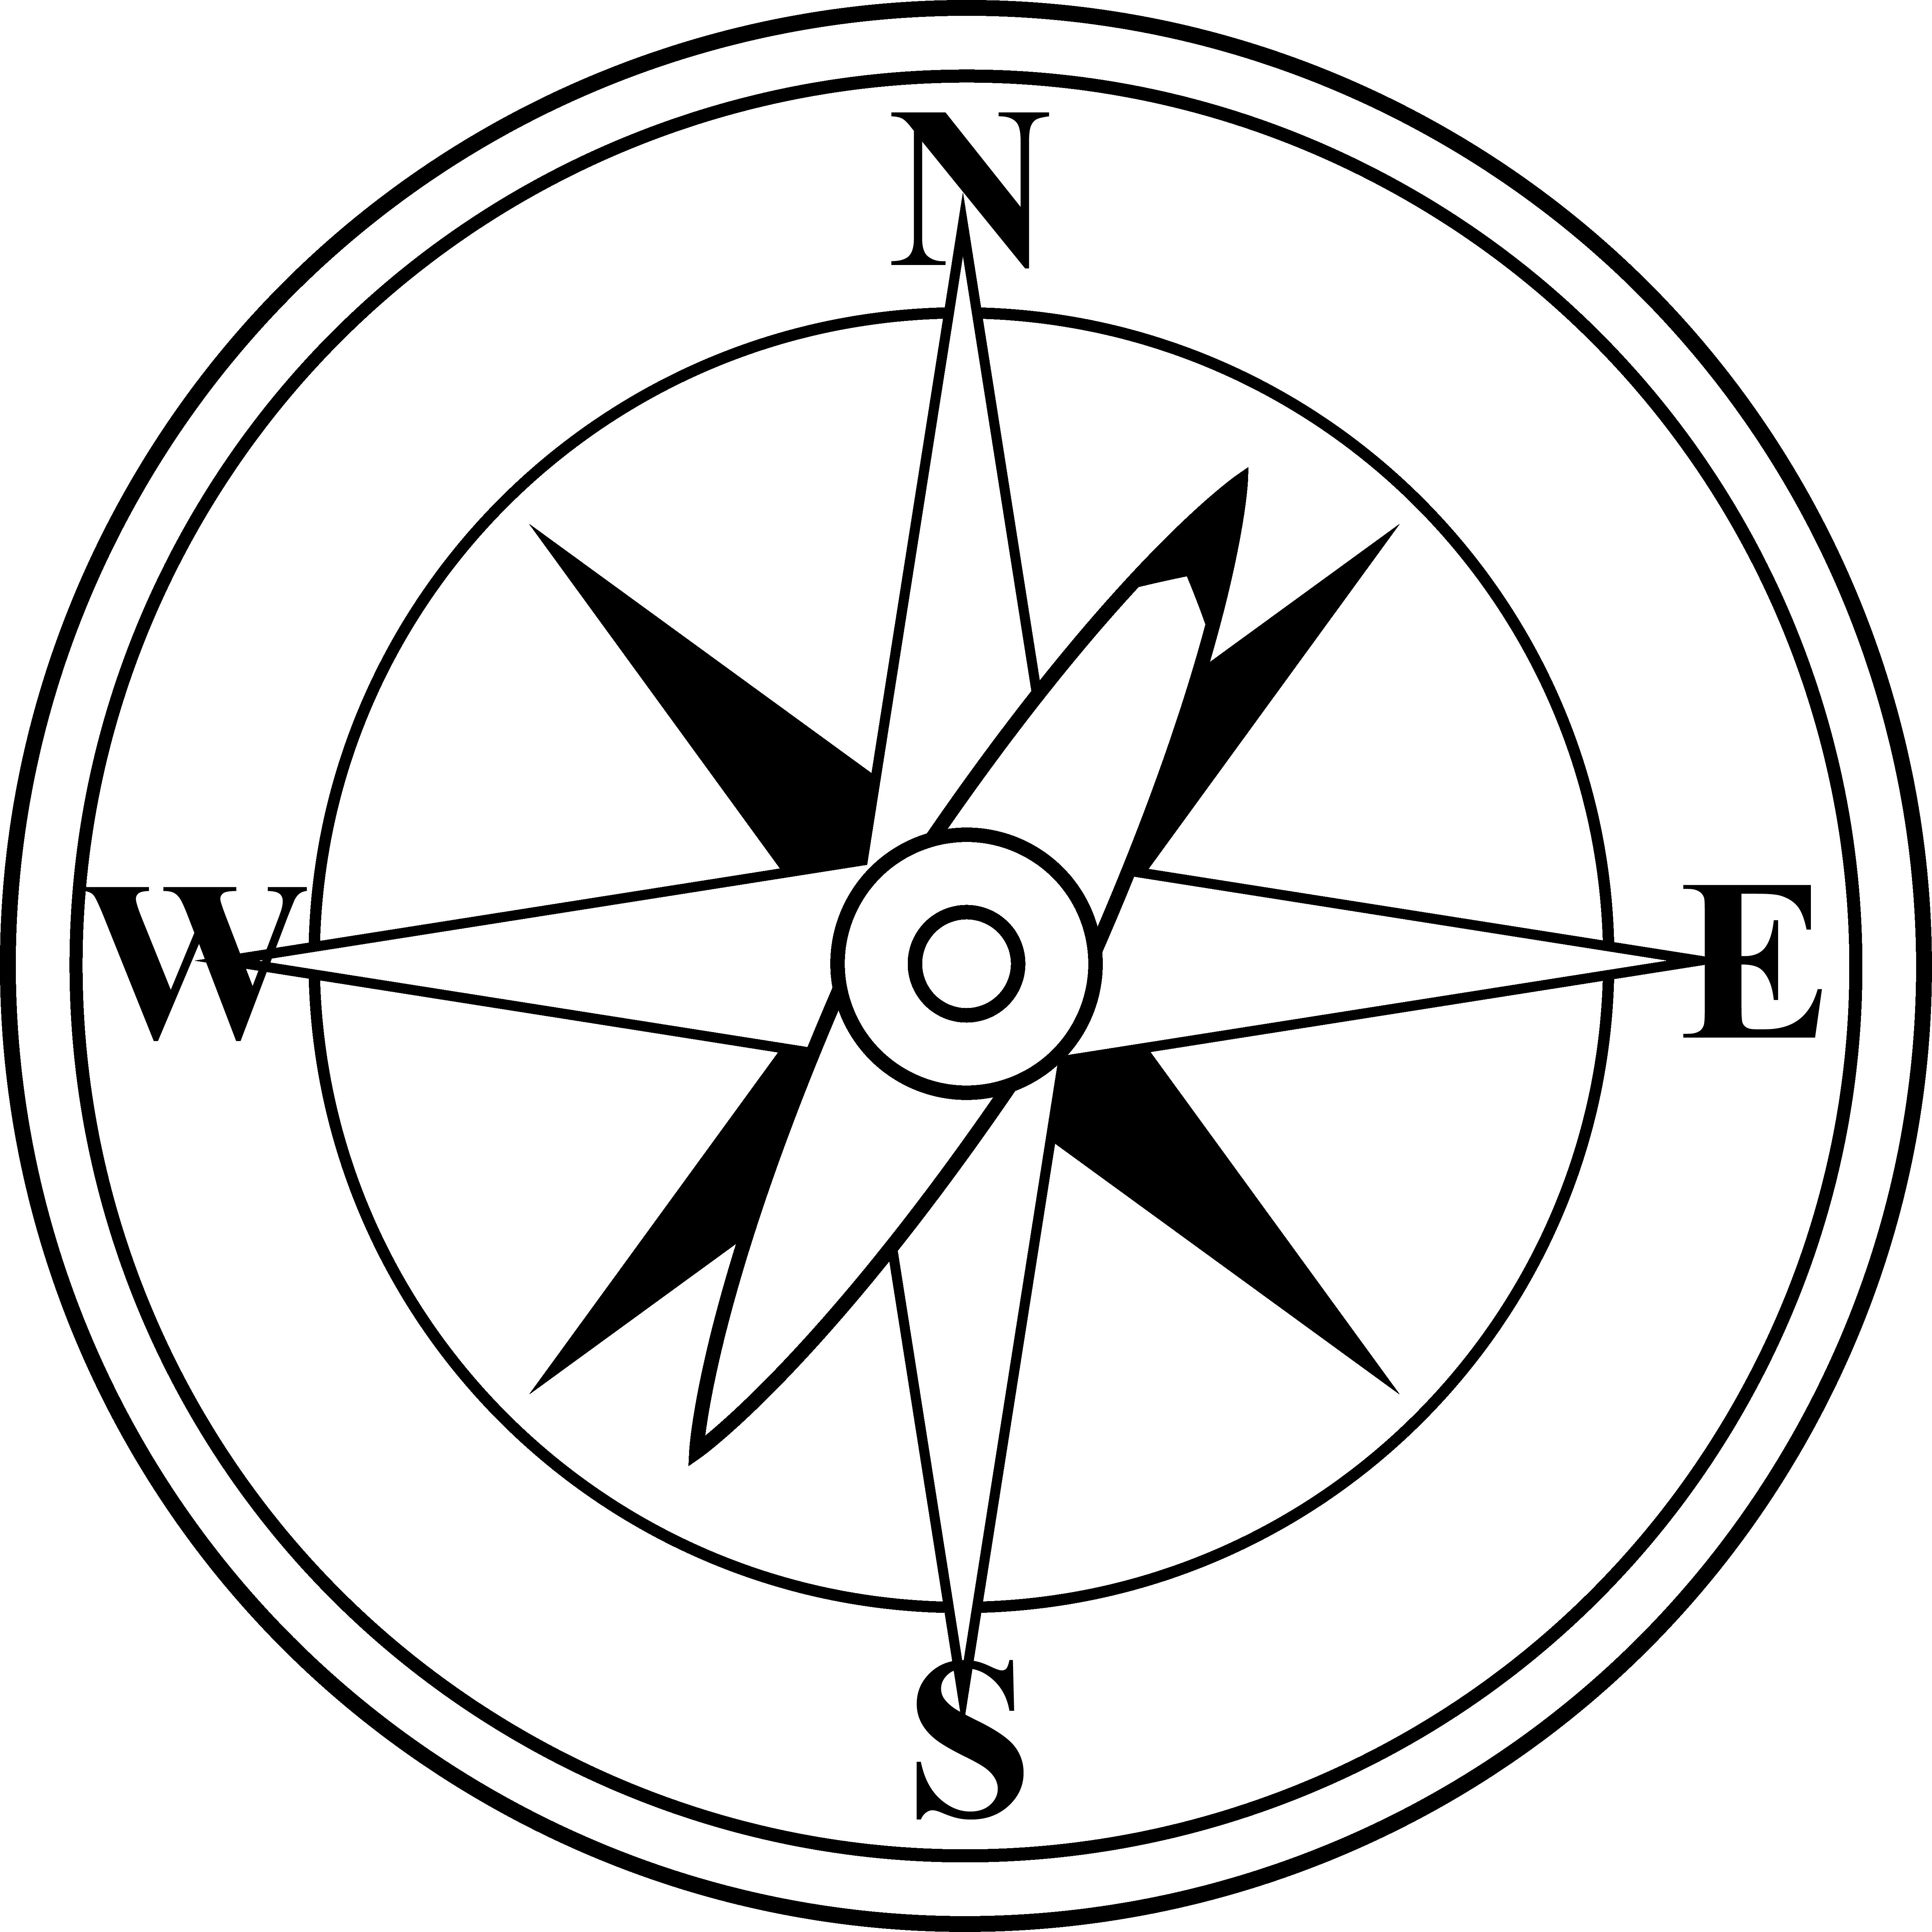 Compass clipart black and white clip art download Compass black and whitepass free clip art - WikiClipArt clip art download